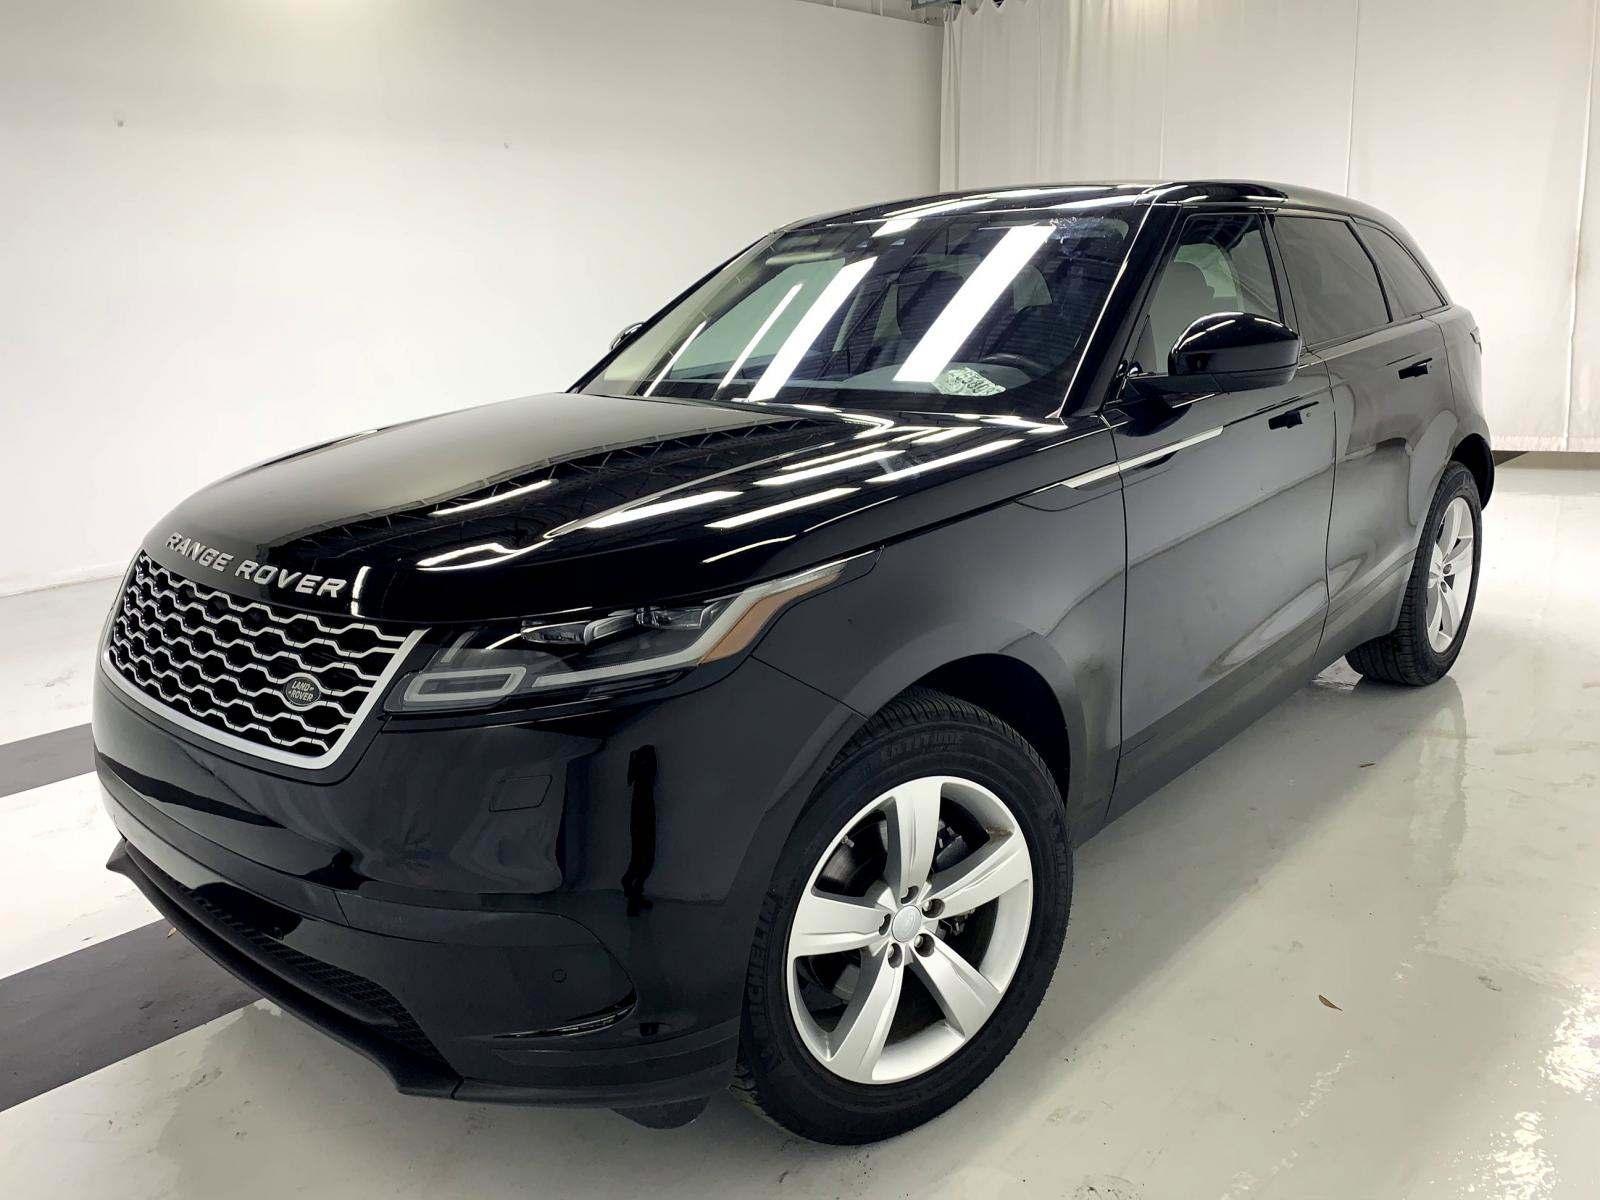 Range Rover Velar For Sale >> Used 2019 Land Rover Range Rover Velar For Sale 46 950 Vroom